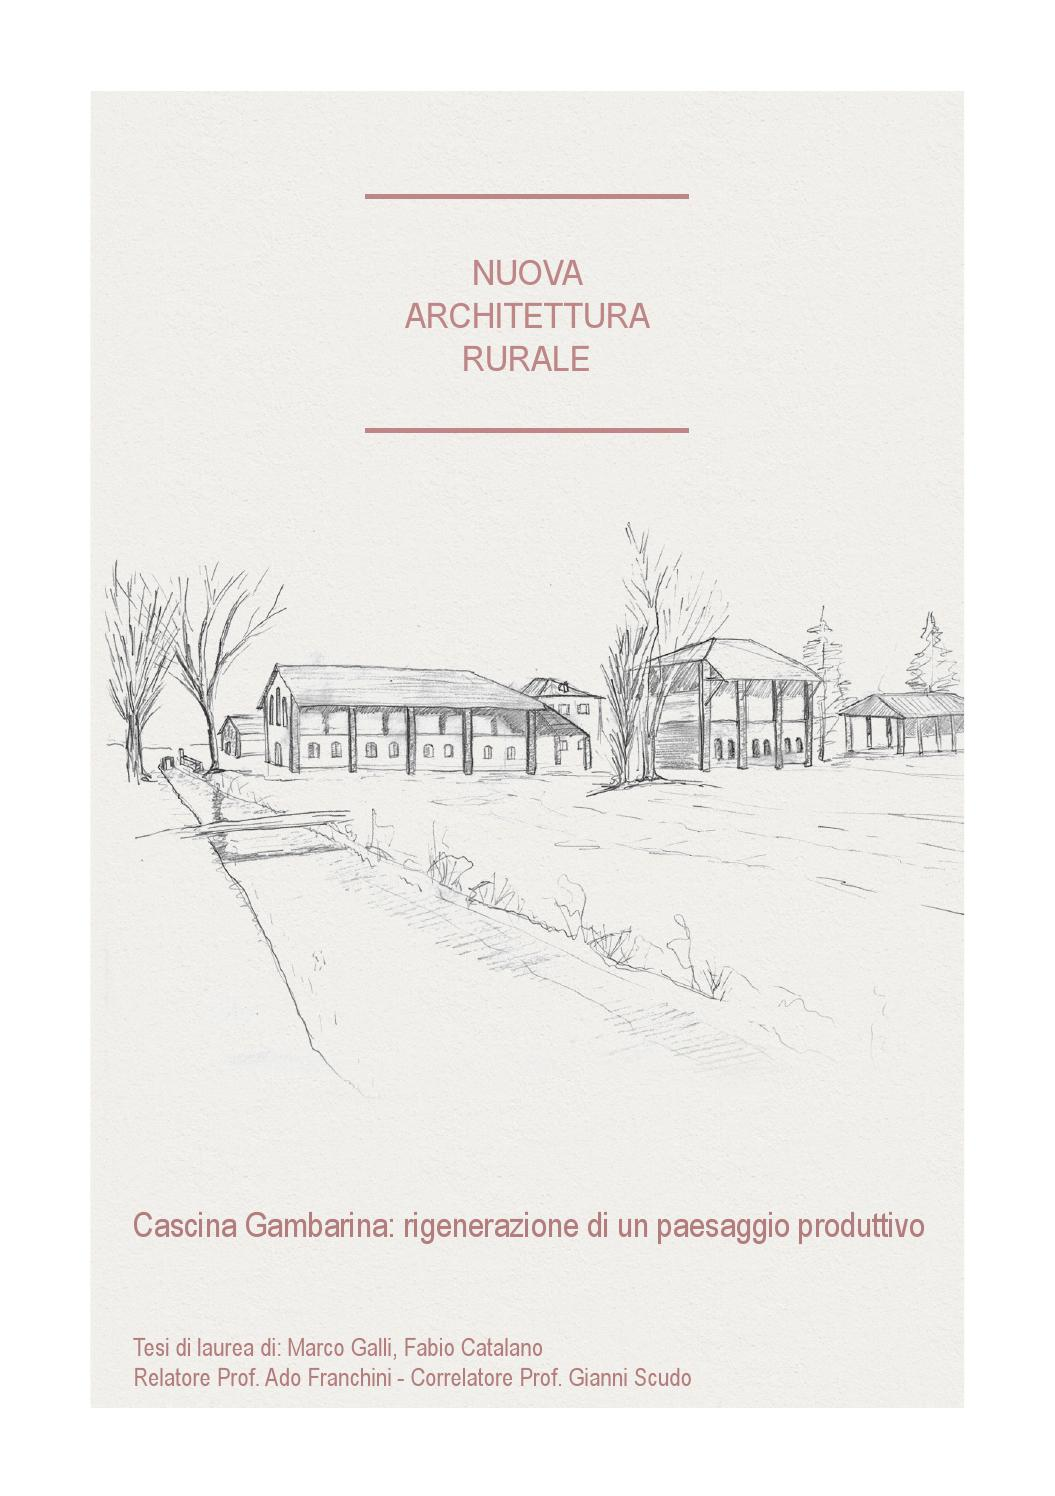 Nuova Architettura Rurale by Marco Galli  Issuu